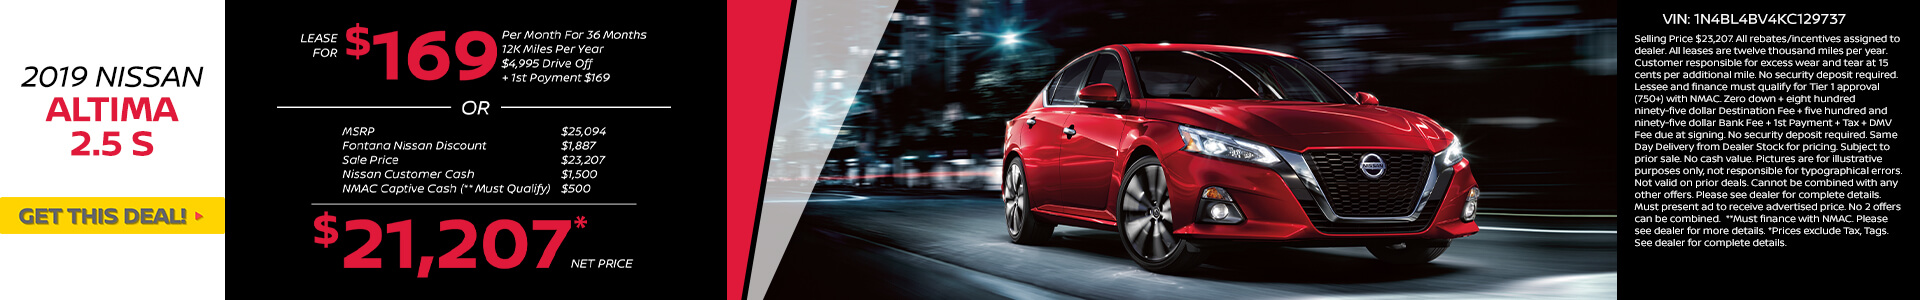 Nissan Altima $169 Lease